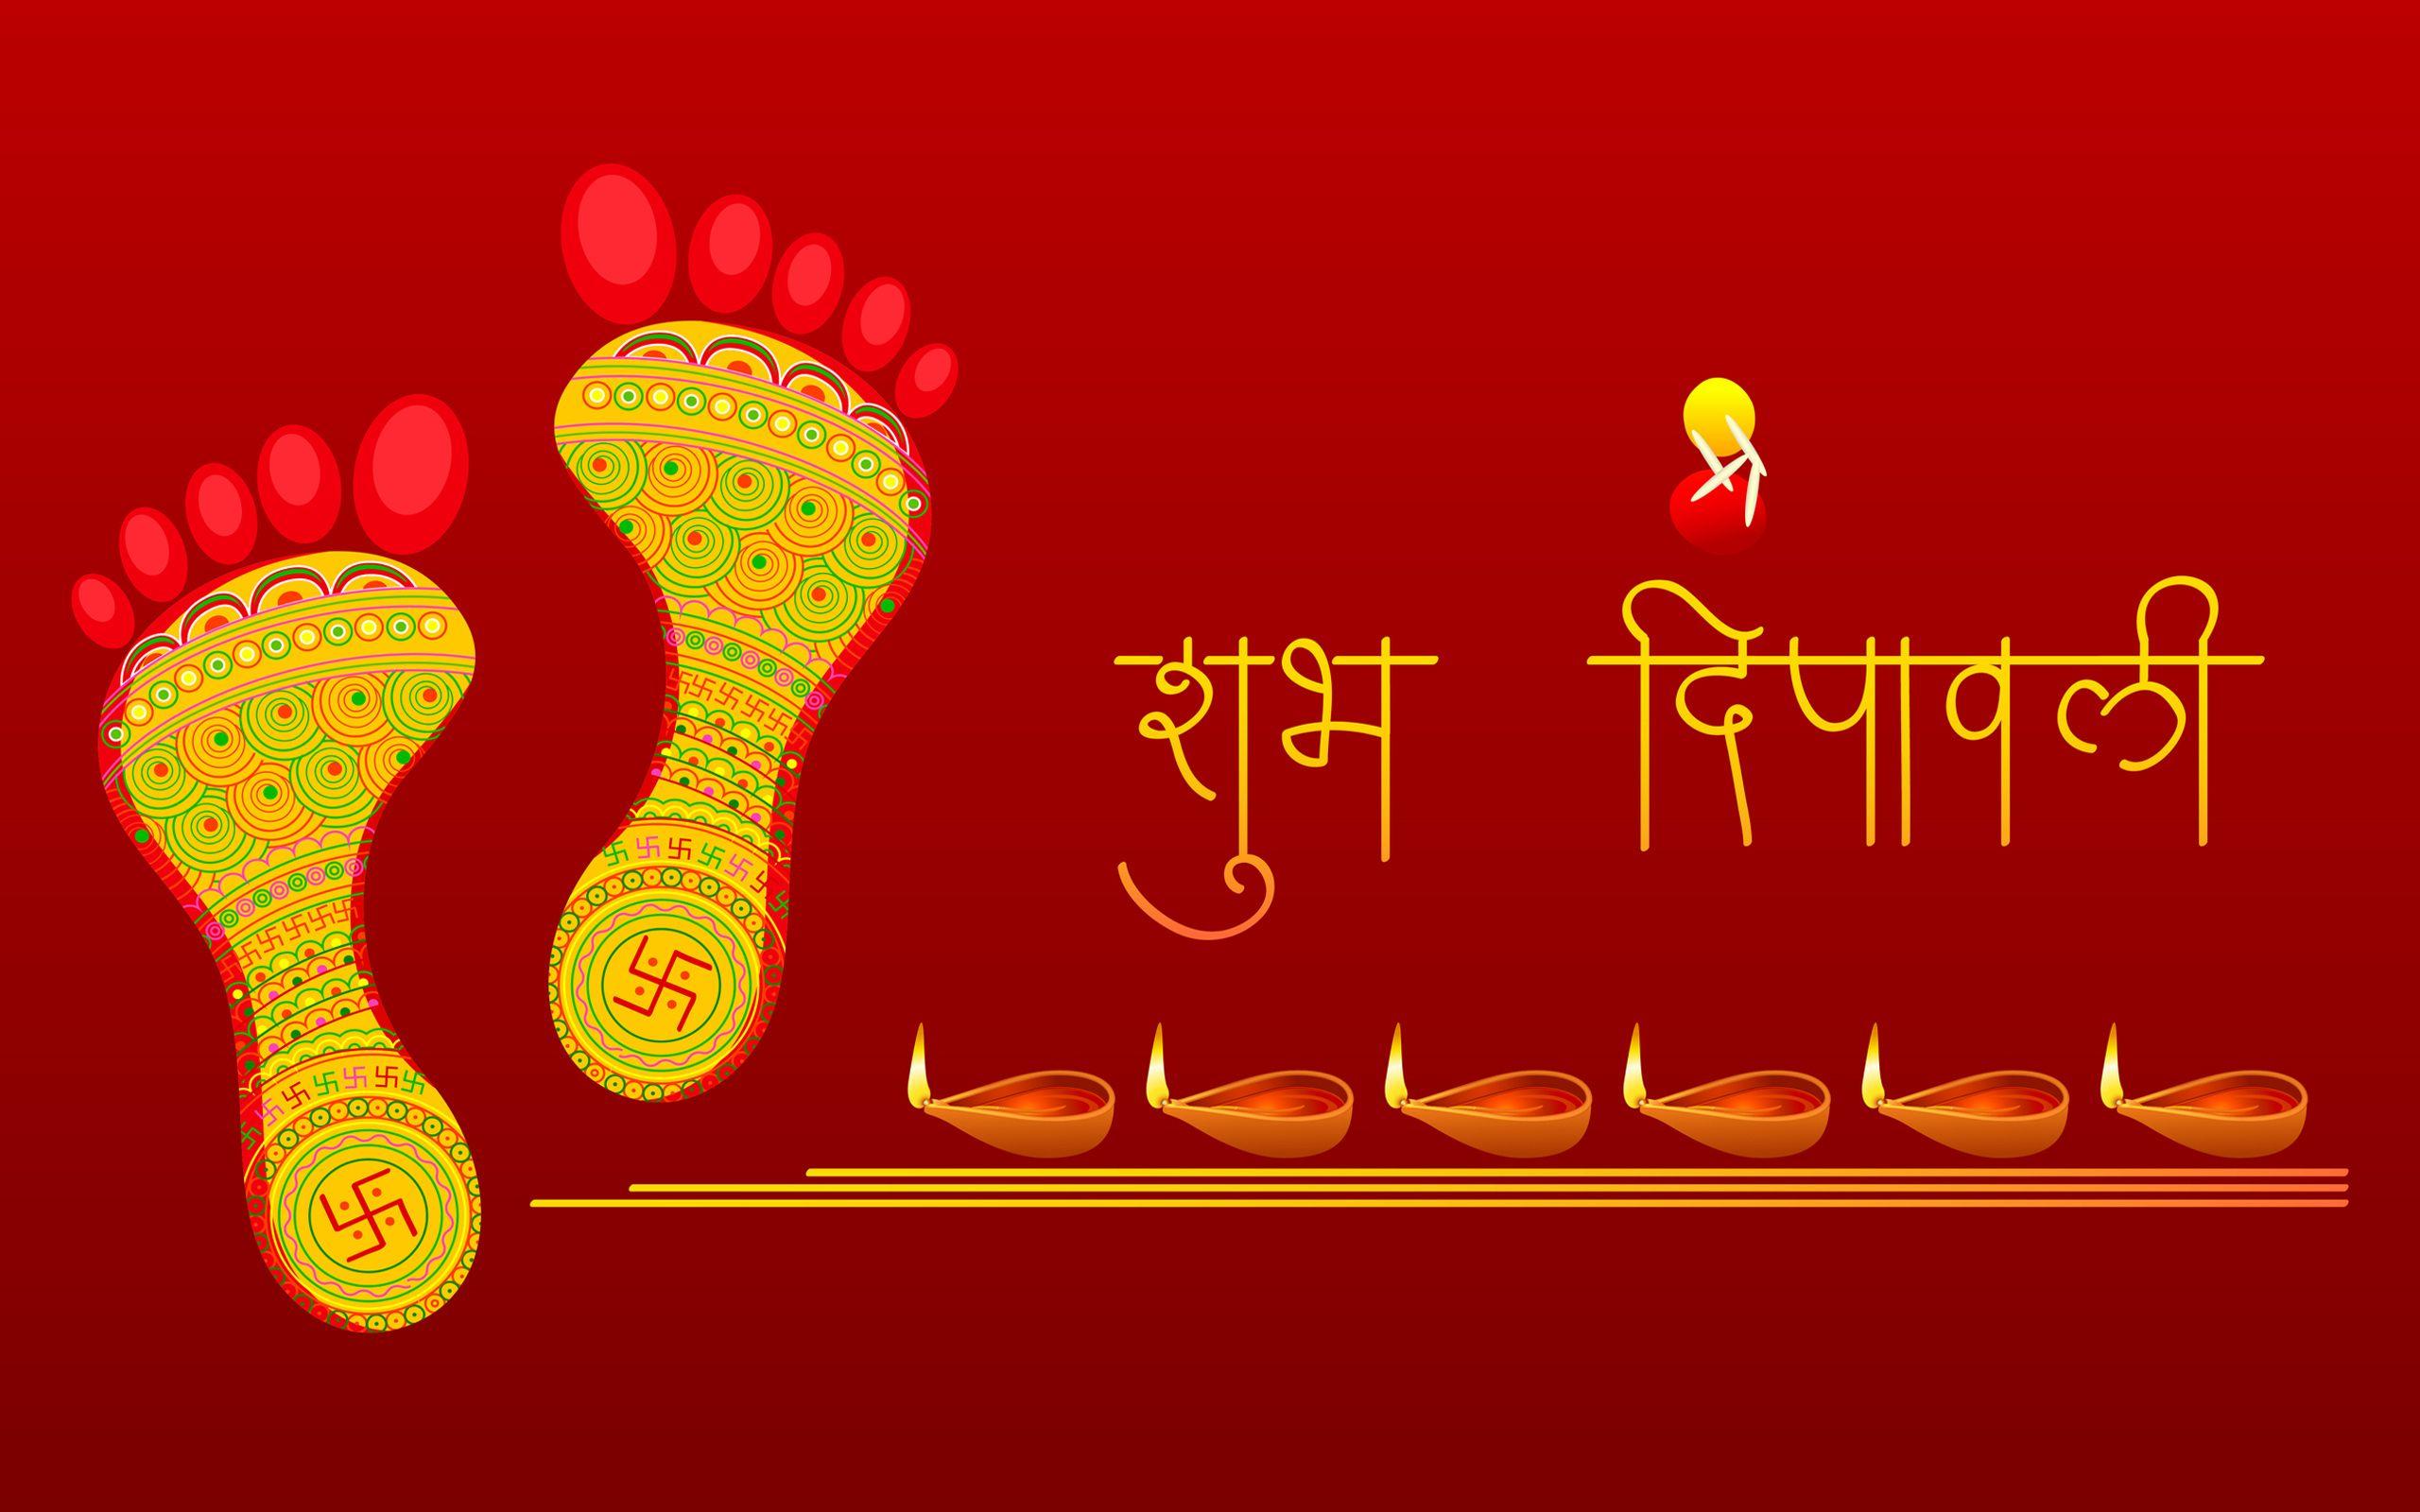 Happy Diwali And Dhanteras Wallpapers: Subh Deepawali Laxmiji Footprint Hd Wallpaper Happy Diwali